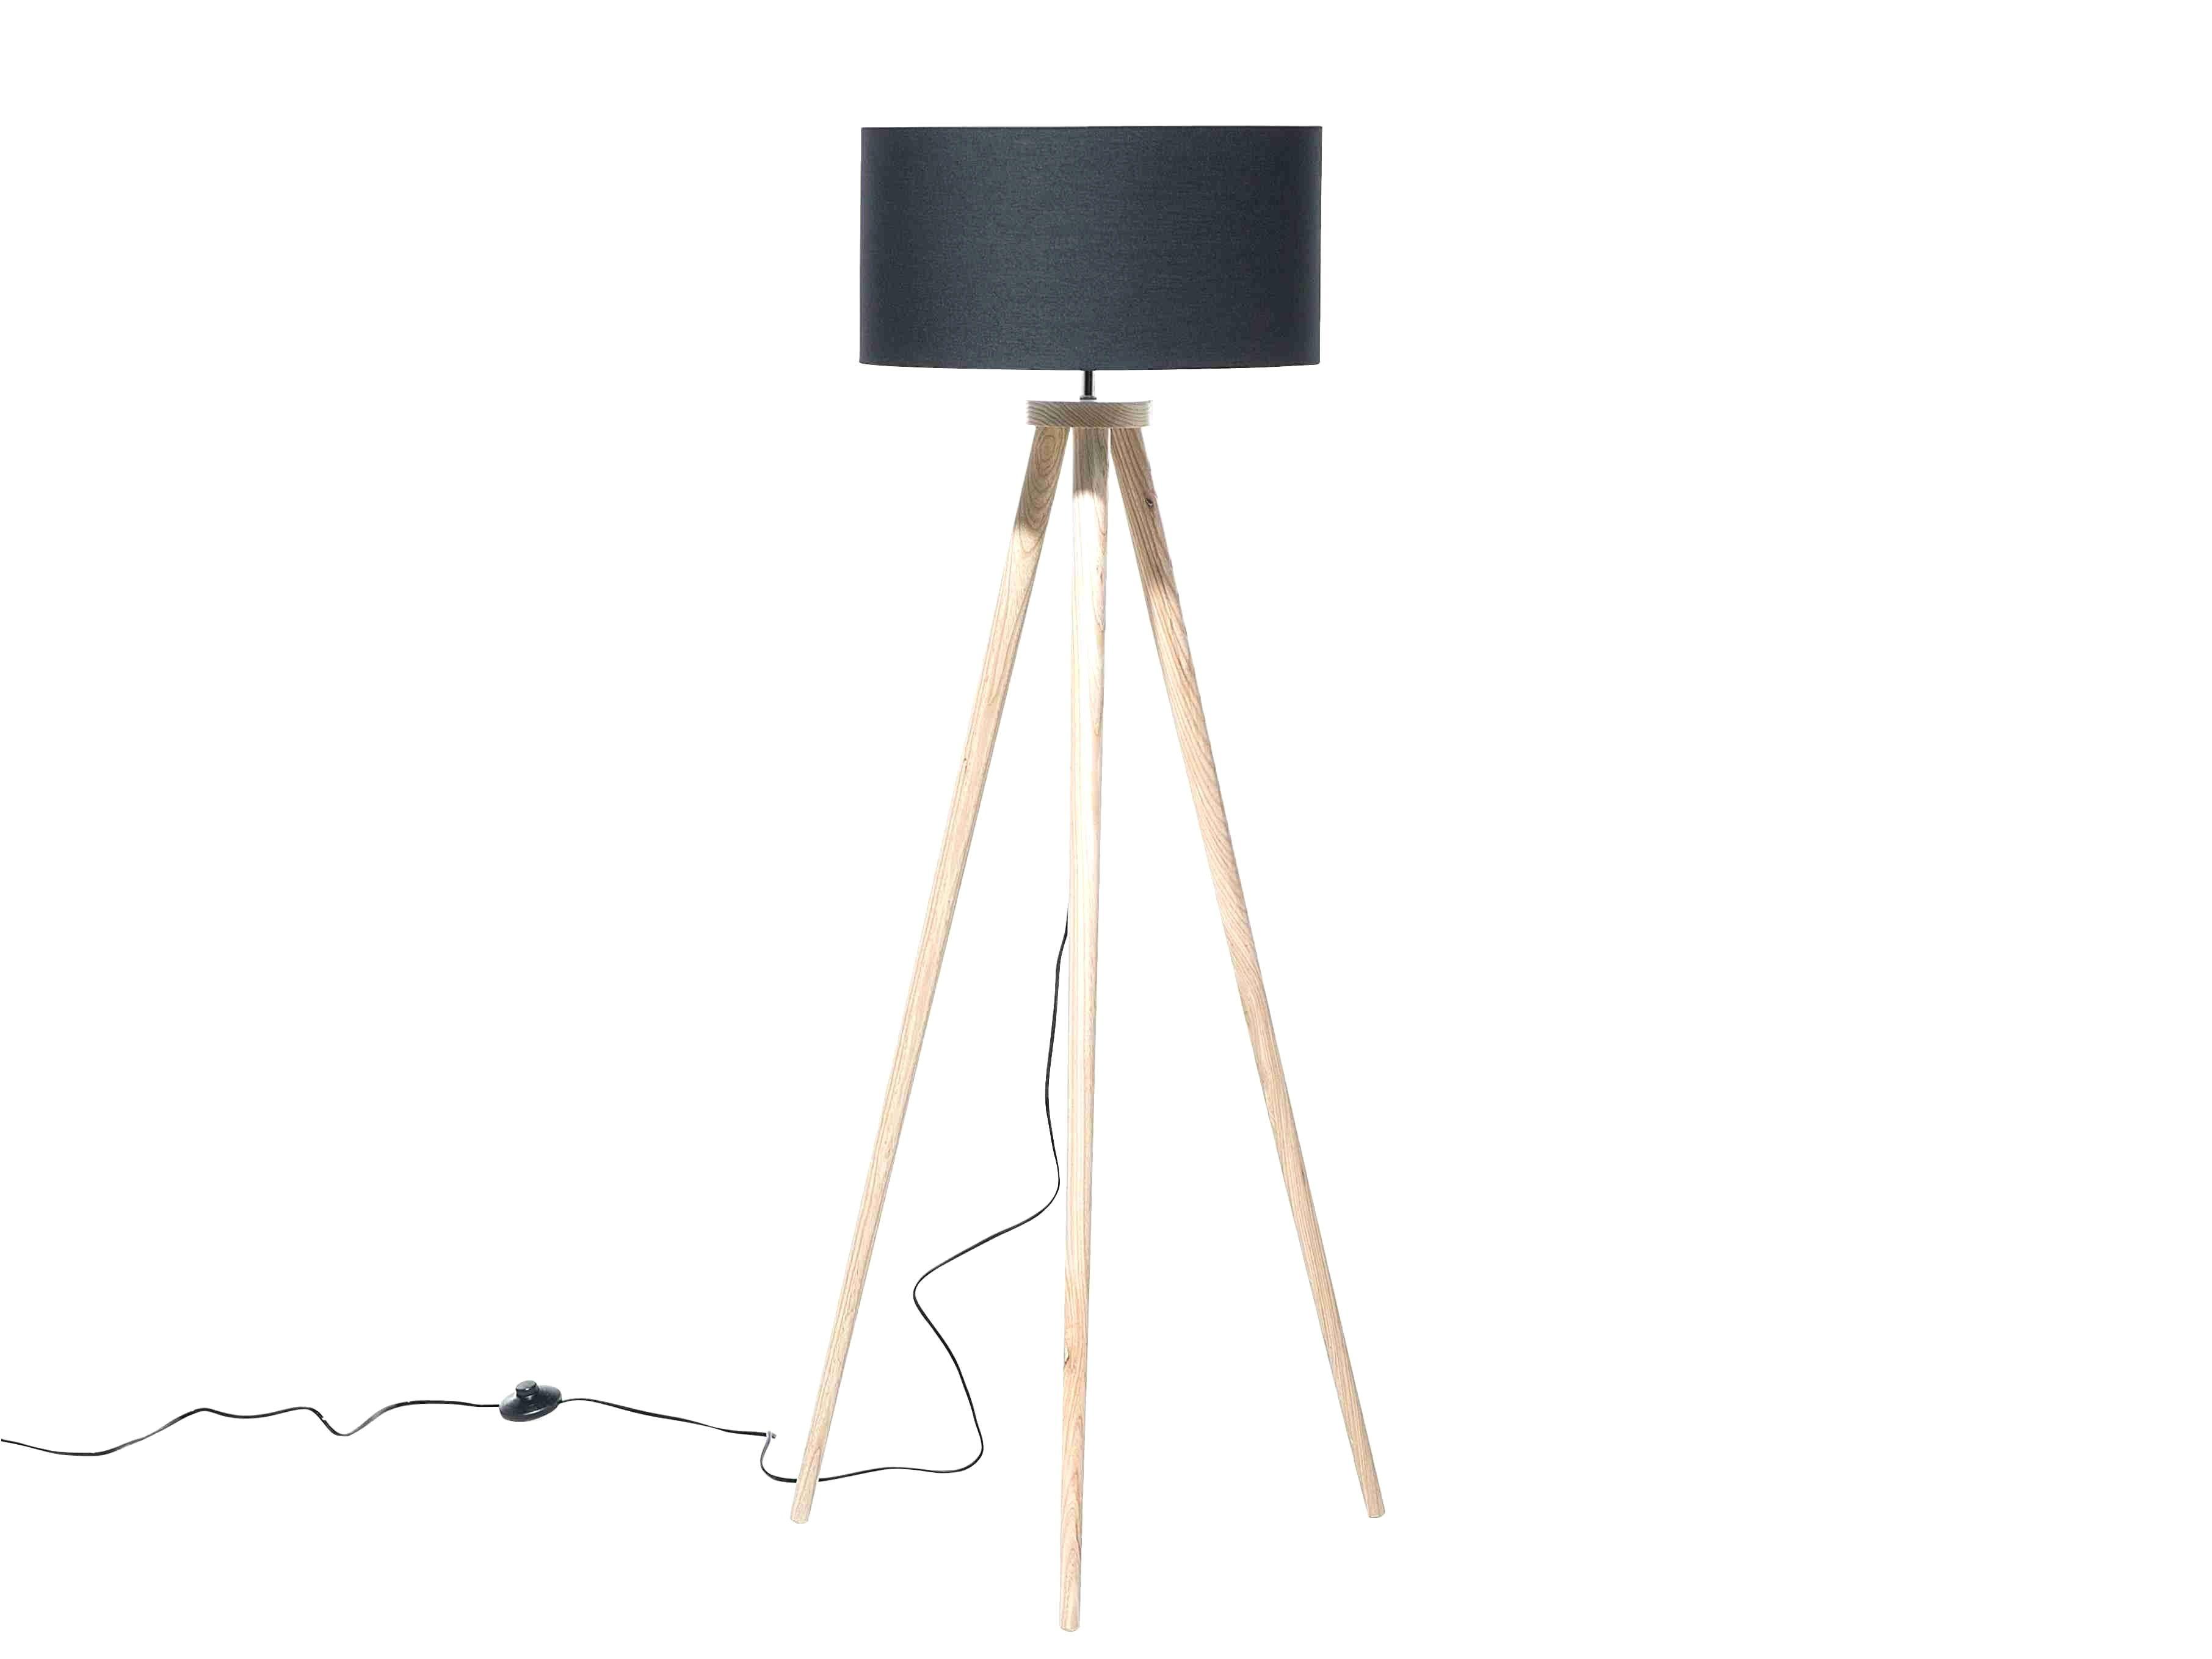 20 Limitee Luminaire Exterieur Ikea Image